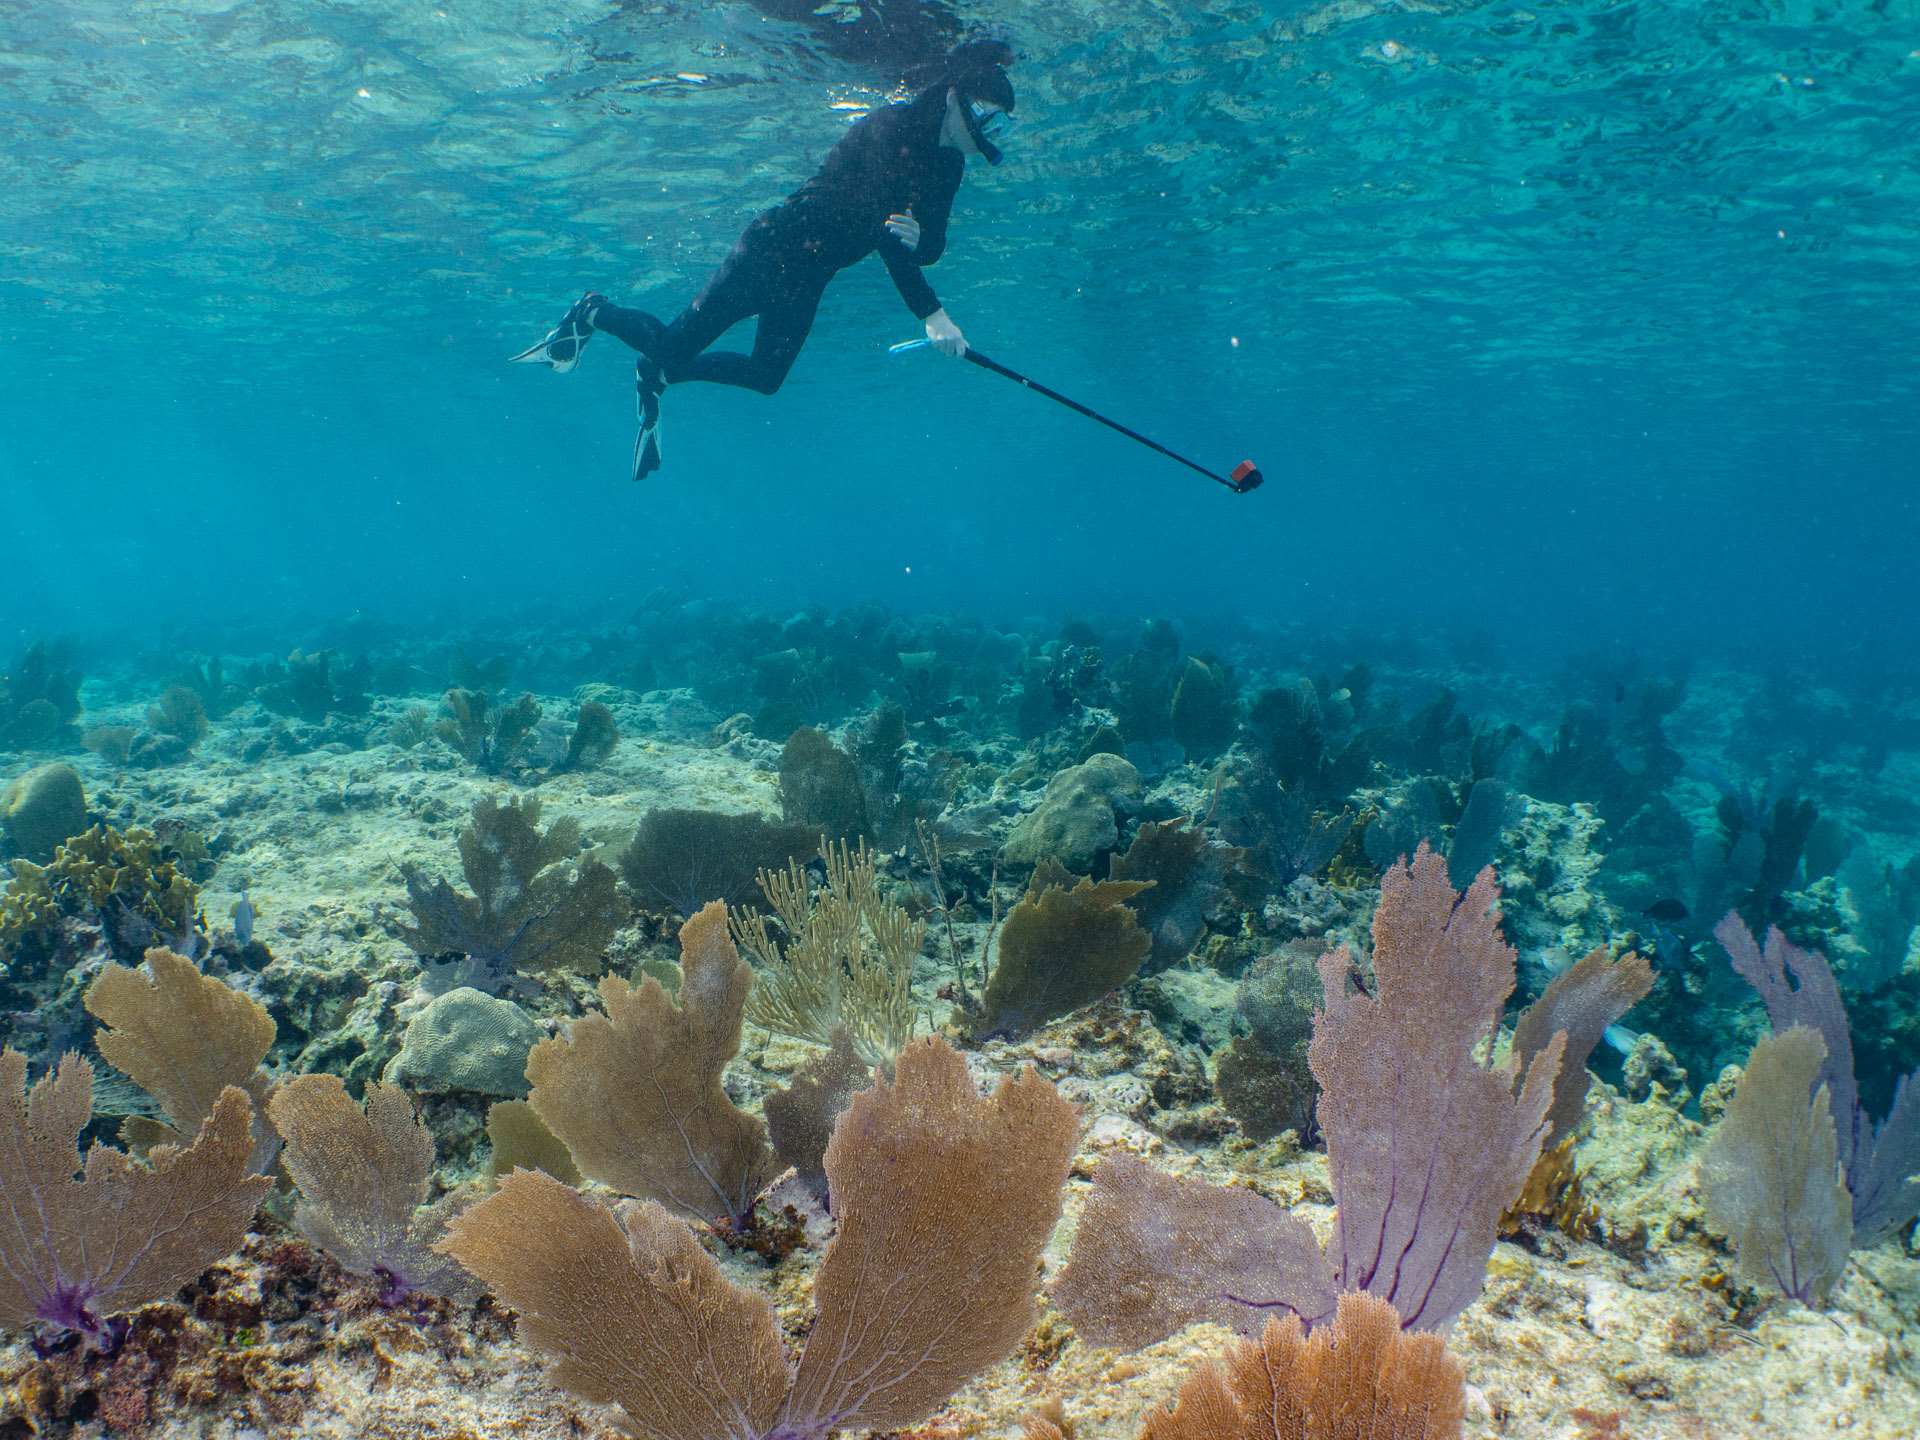 Snorkeler with GoPro